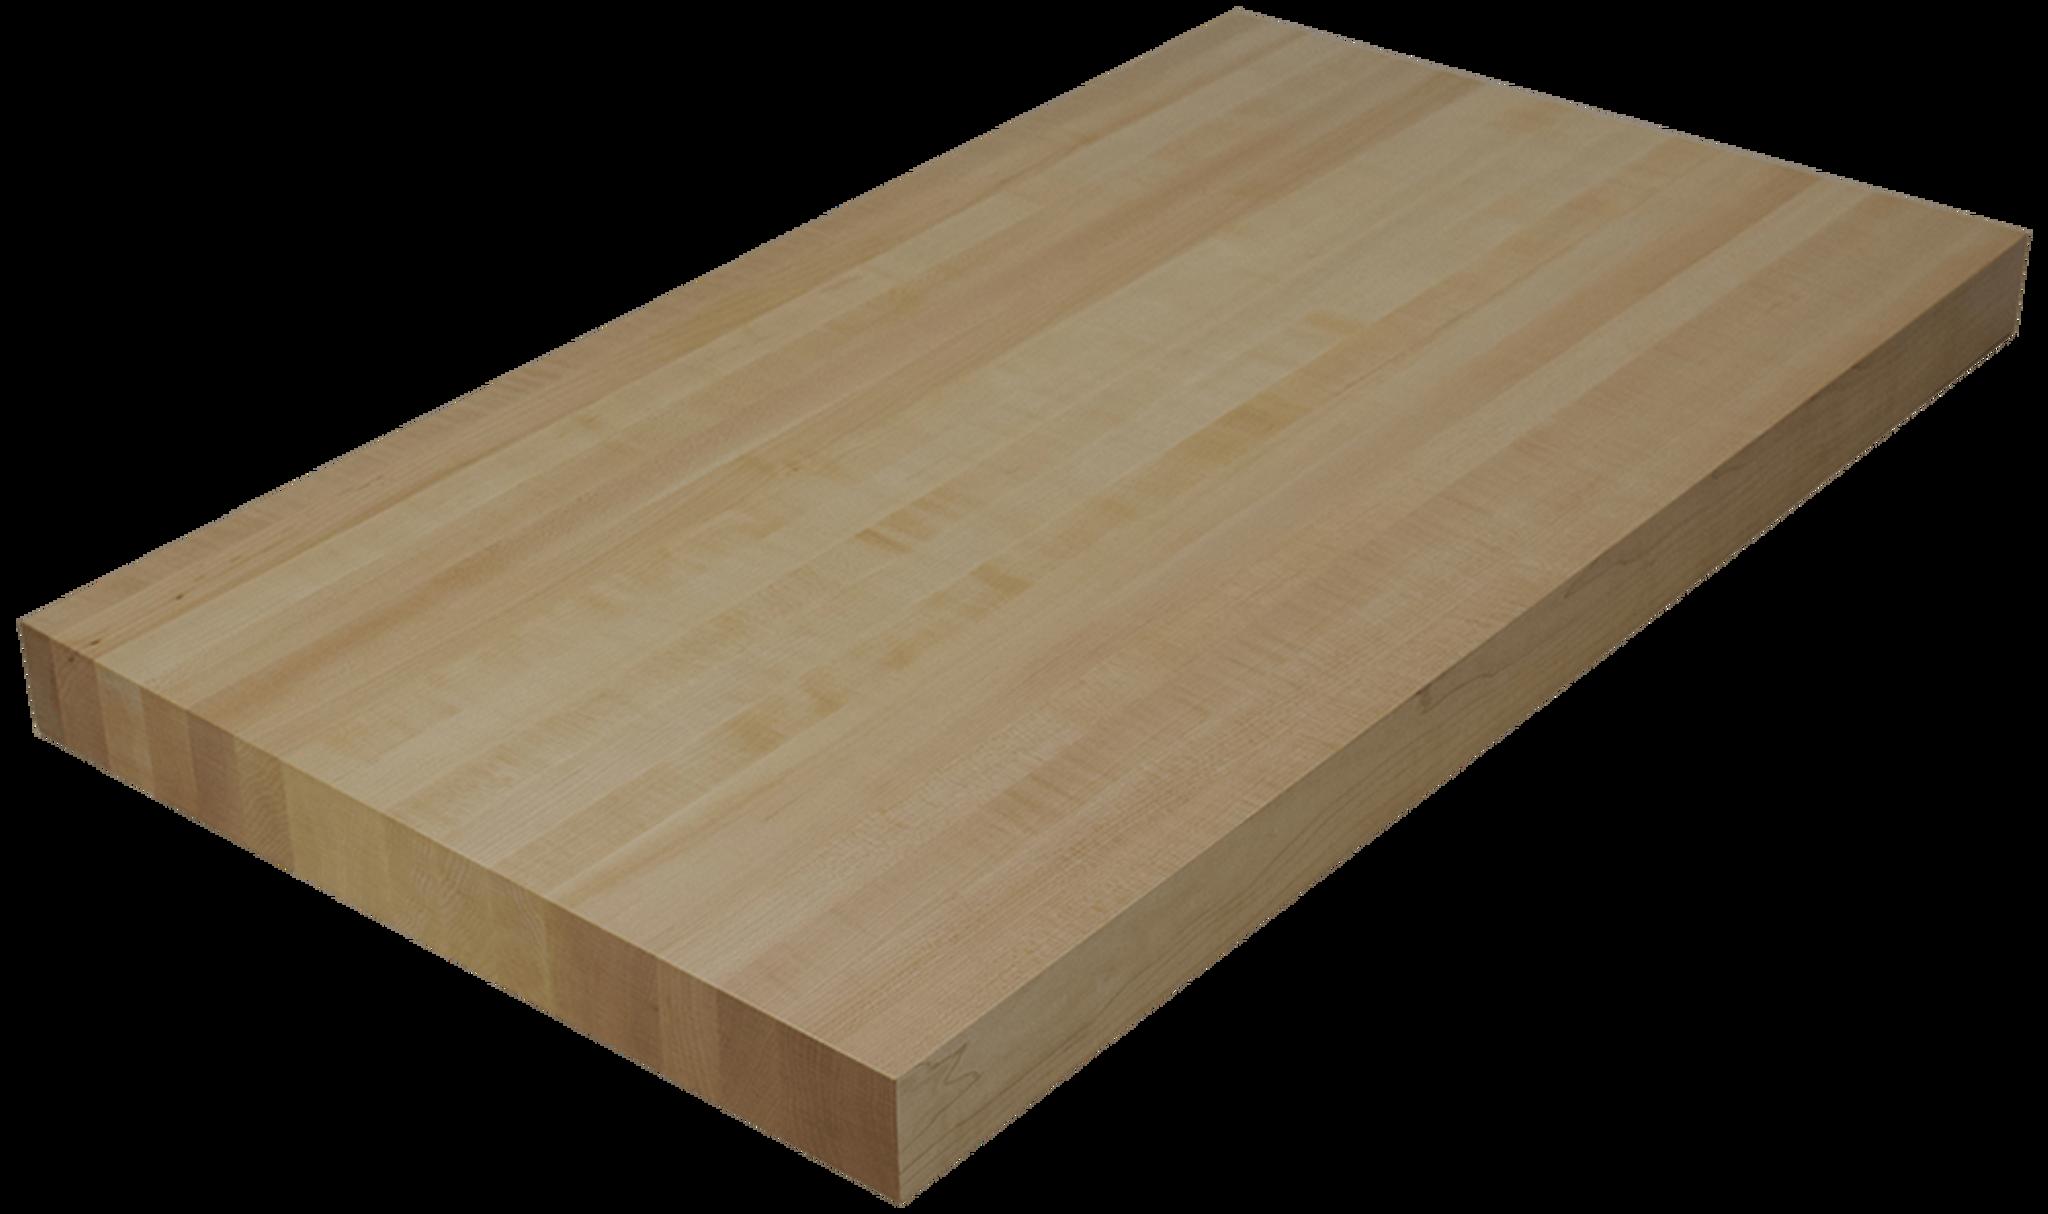 maple edge grain butcher block countertop hardwood. Black Bedroom Furniture Sets. Home Design Ideas